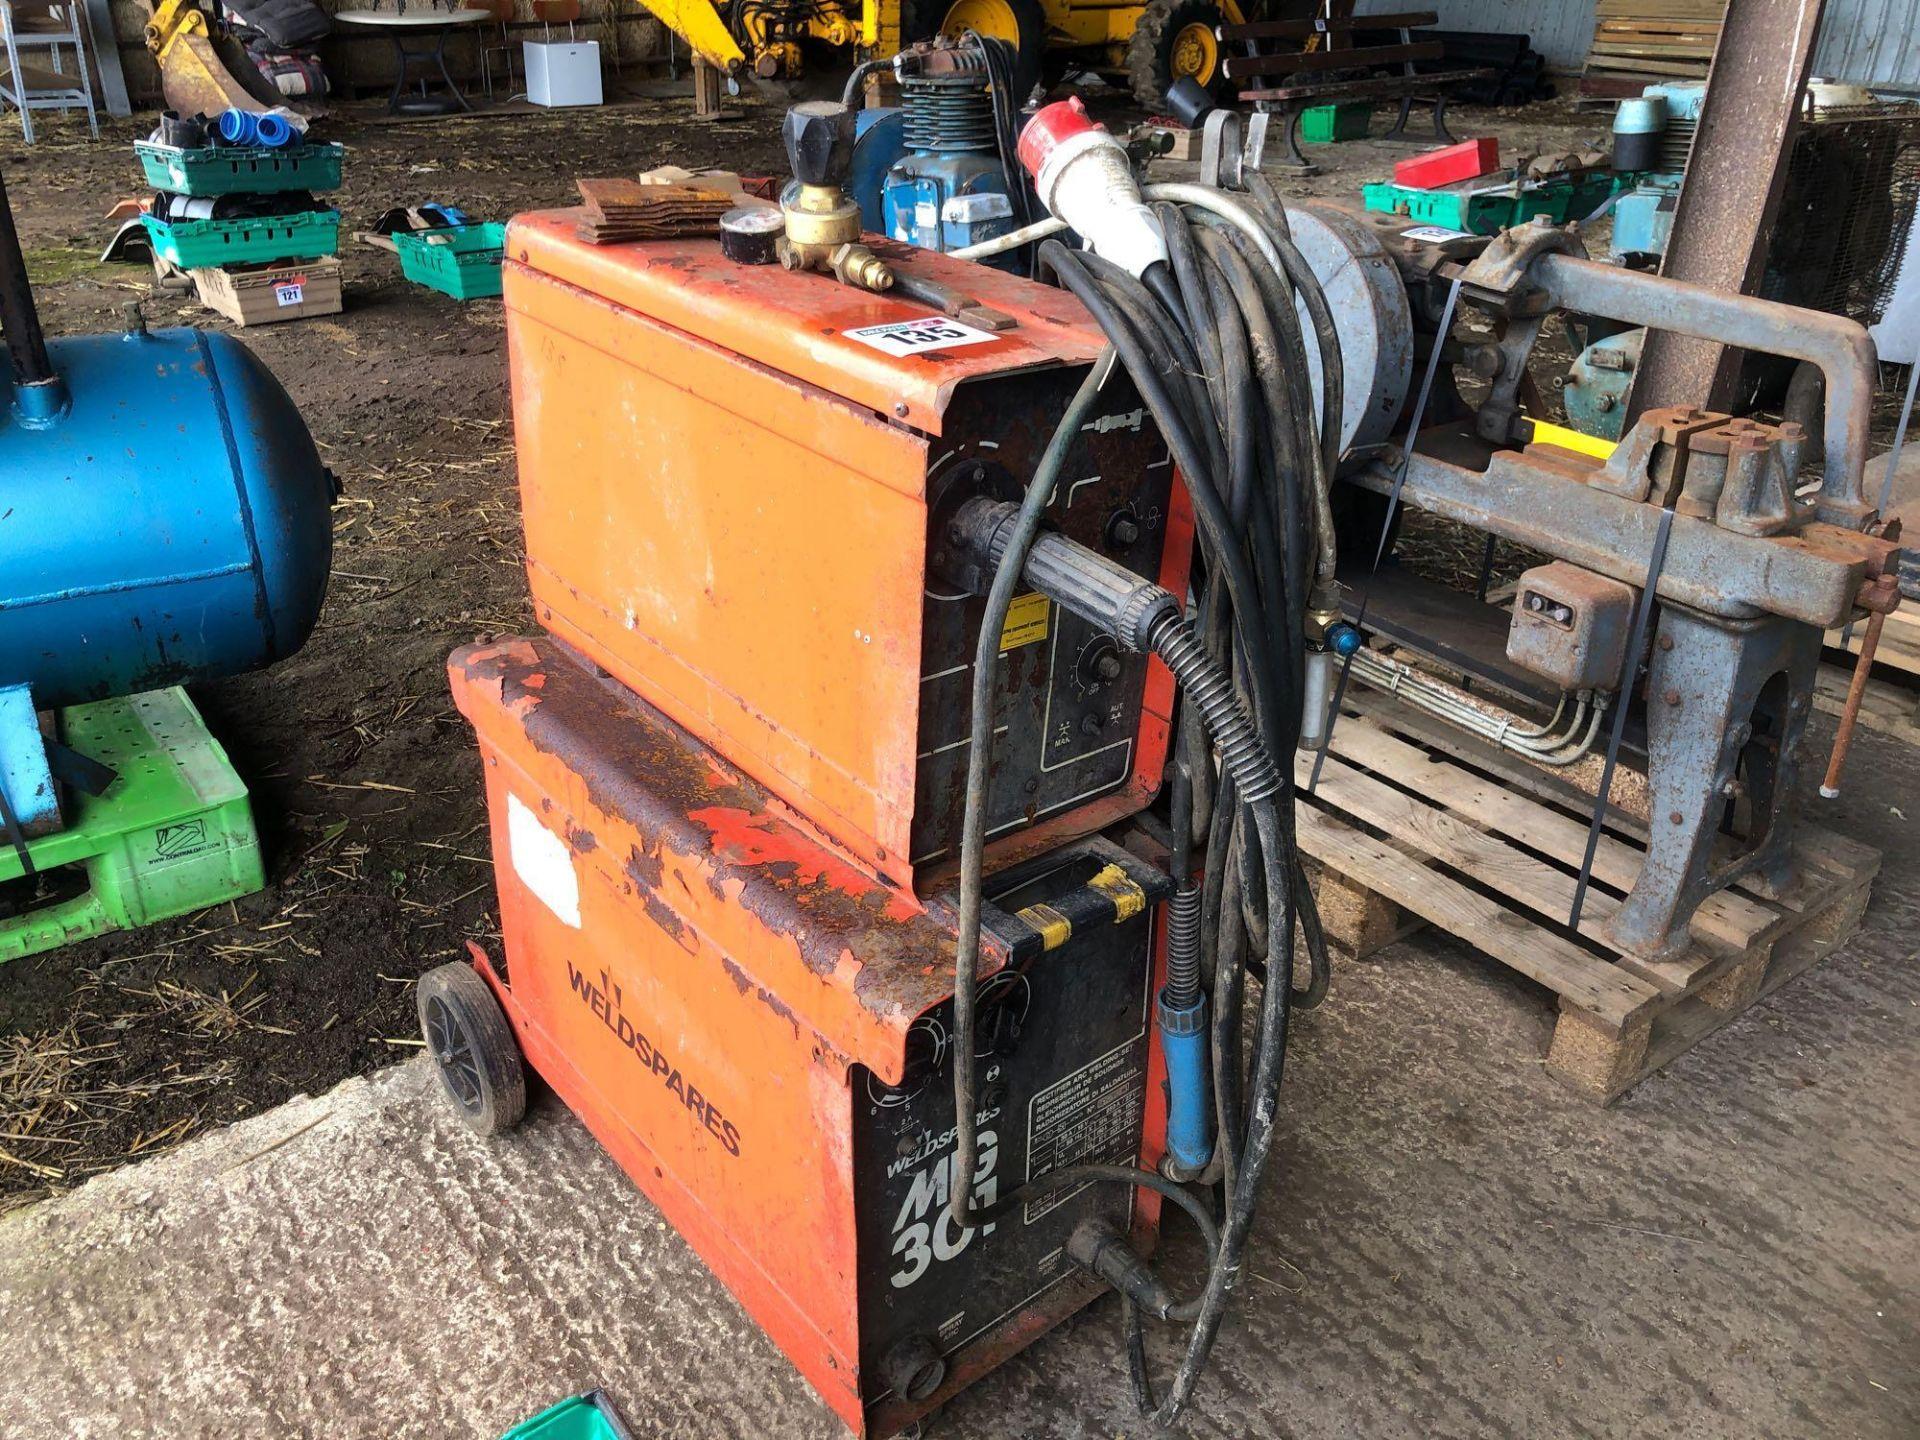 Lot 135 - Weldspare 301 MIG welder, single phase